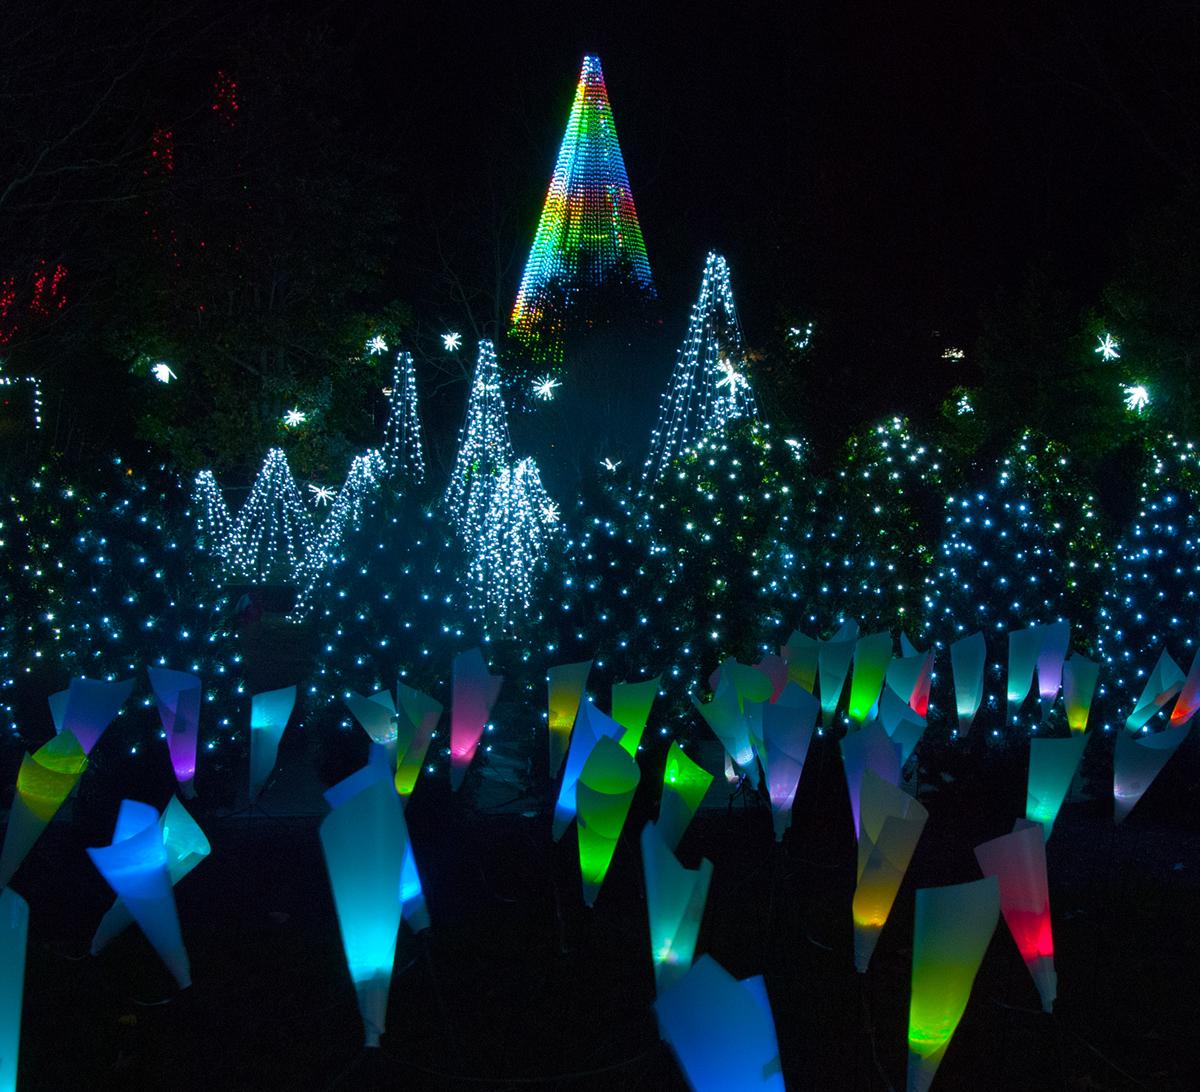 Winter Lights Returns To Nc Arboretum The Laurel Of